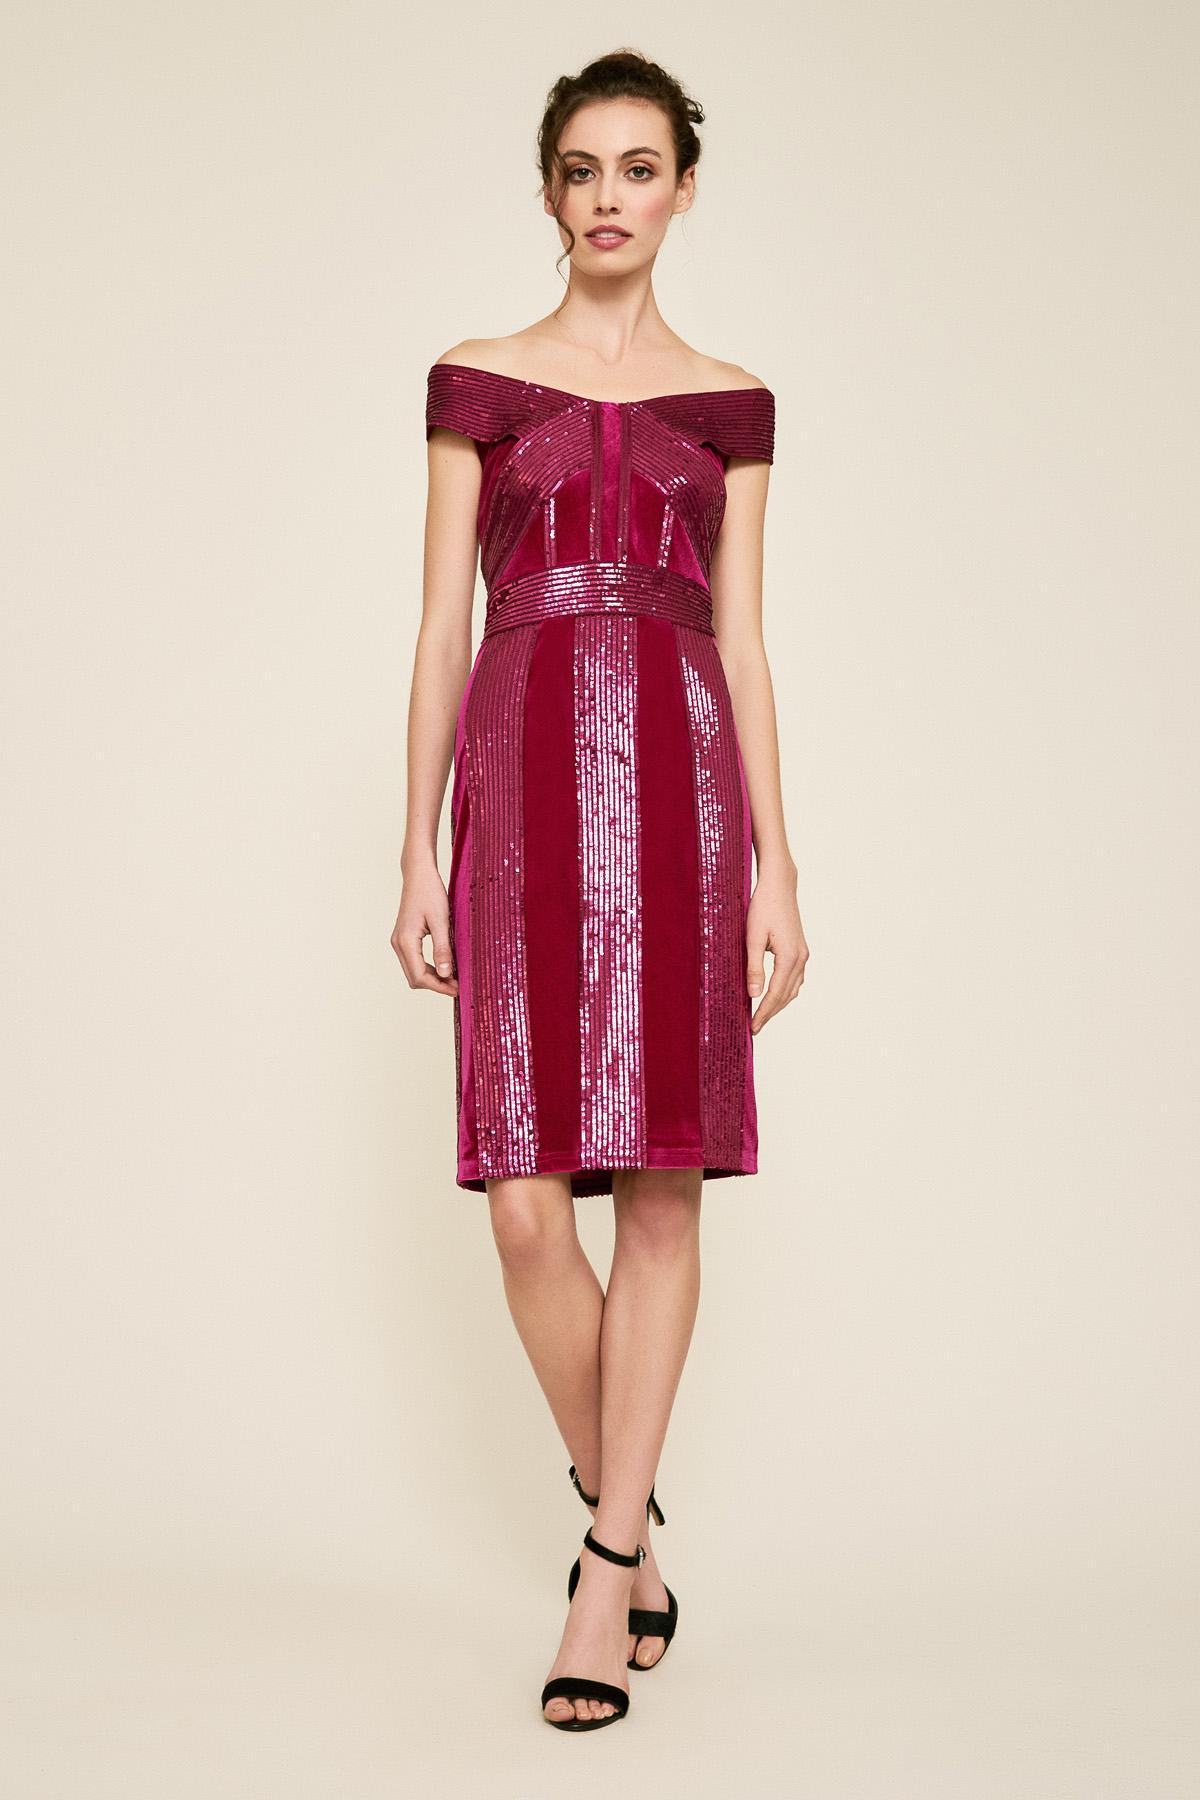 Lyst - Tadashi Shoji Rhea Velvet   Sequin Stripe Dress in Red 4f97ffa17